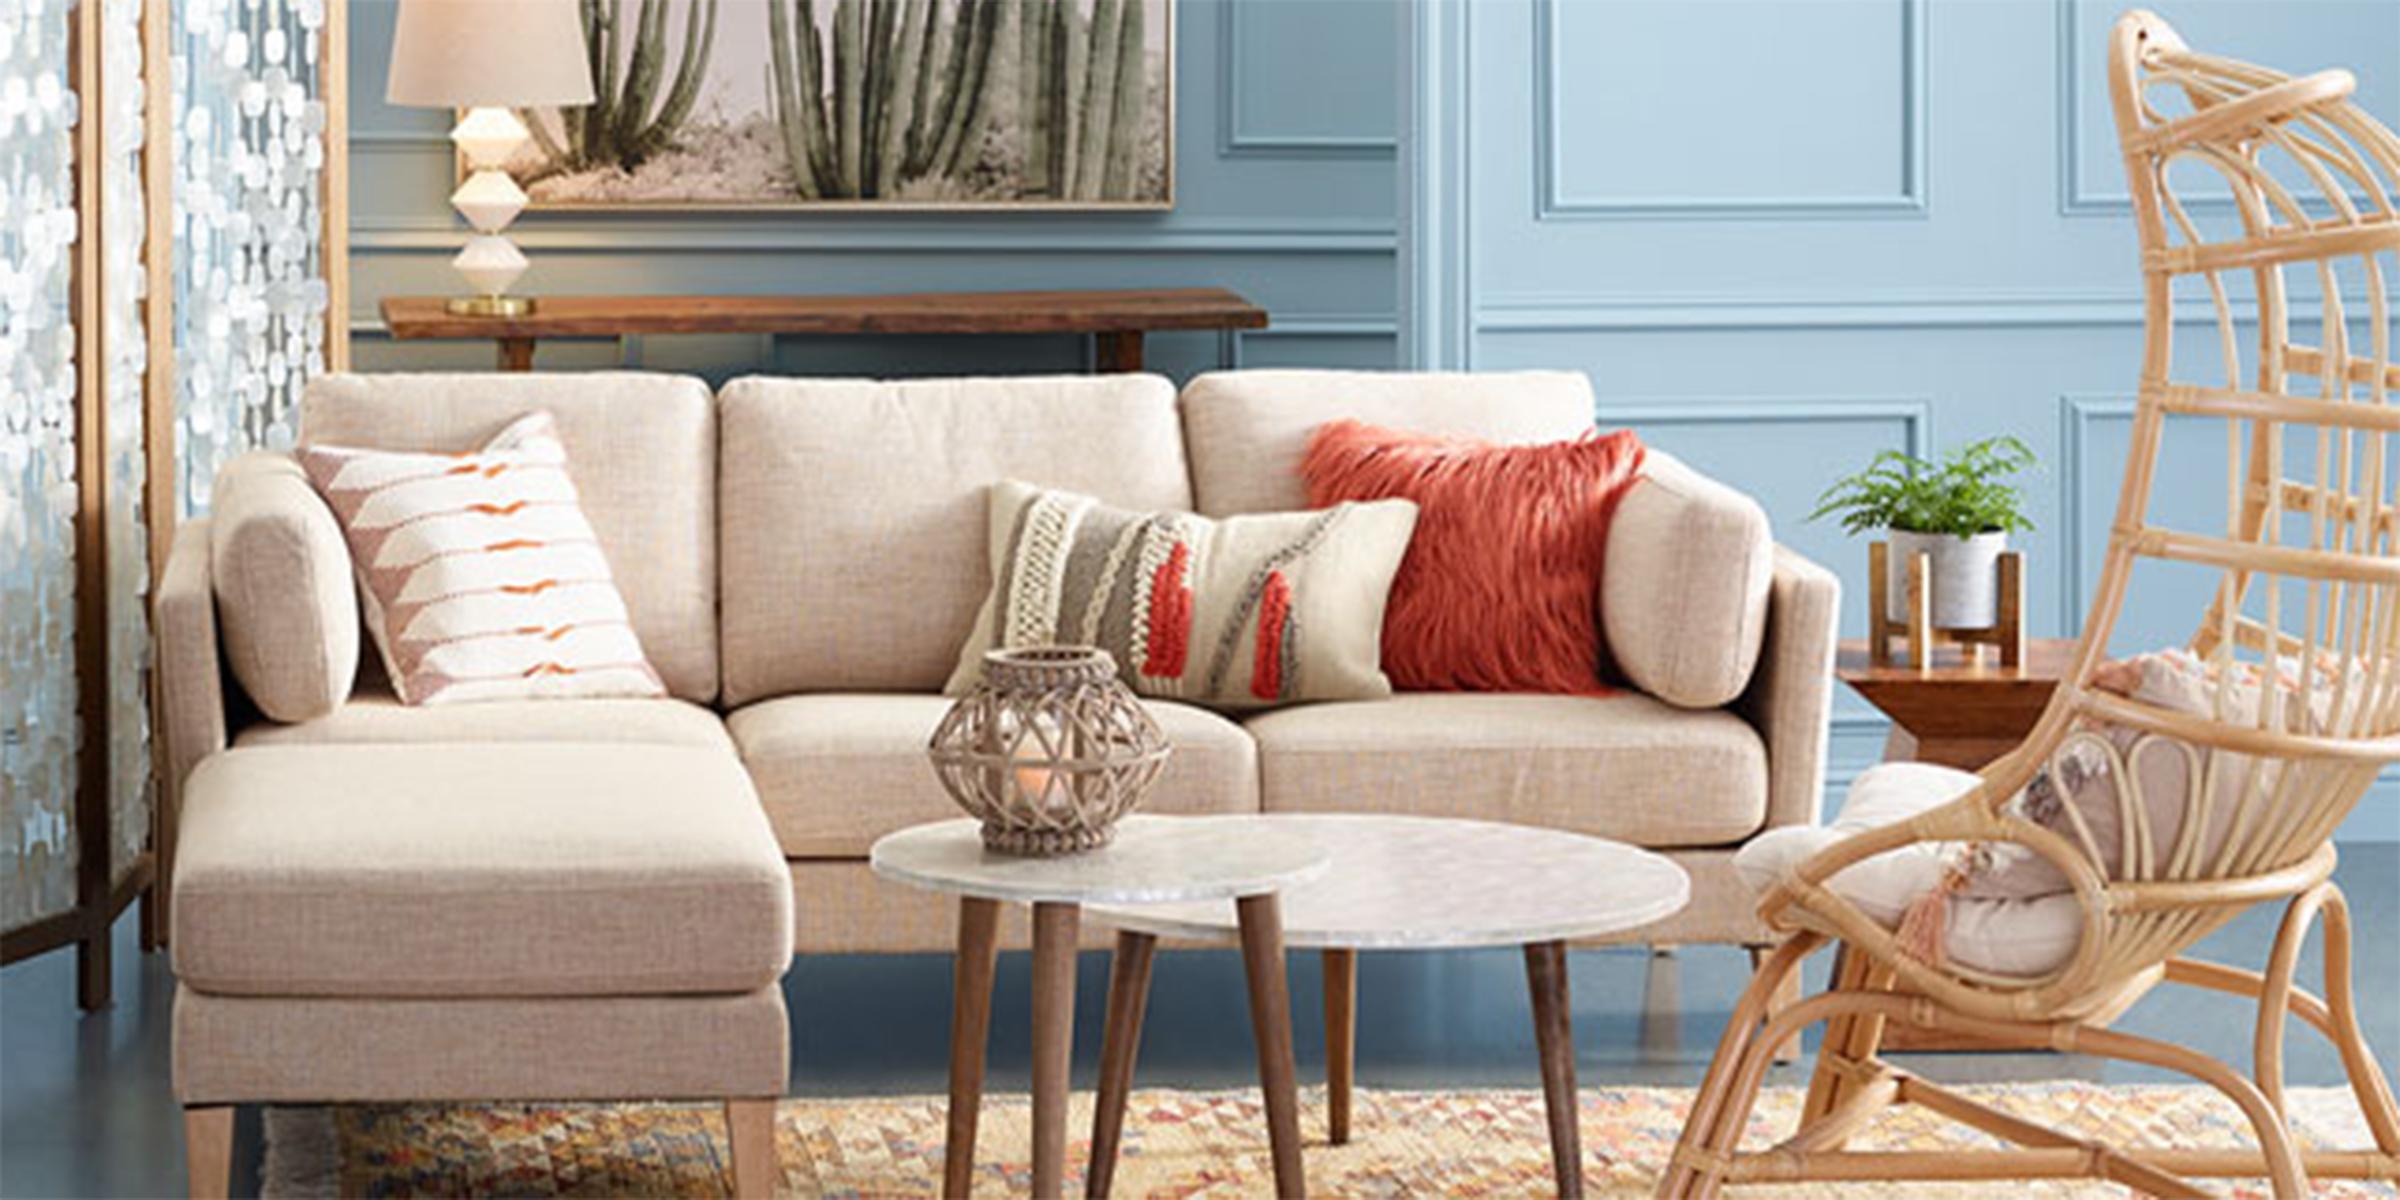 Deal Alert 30 Percent Off All Furniture At World Market